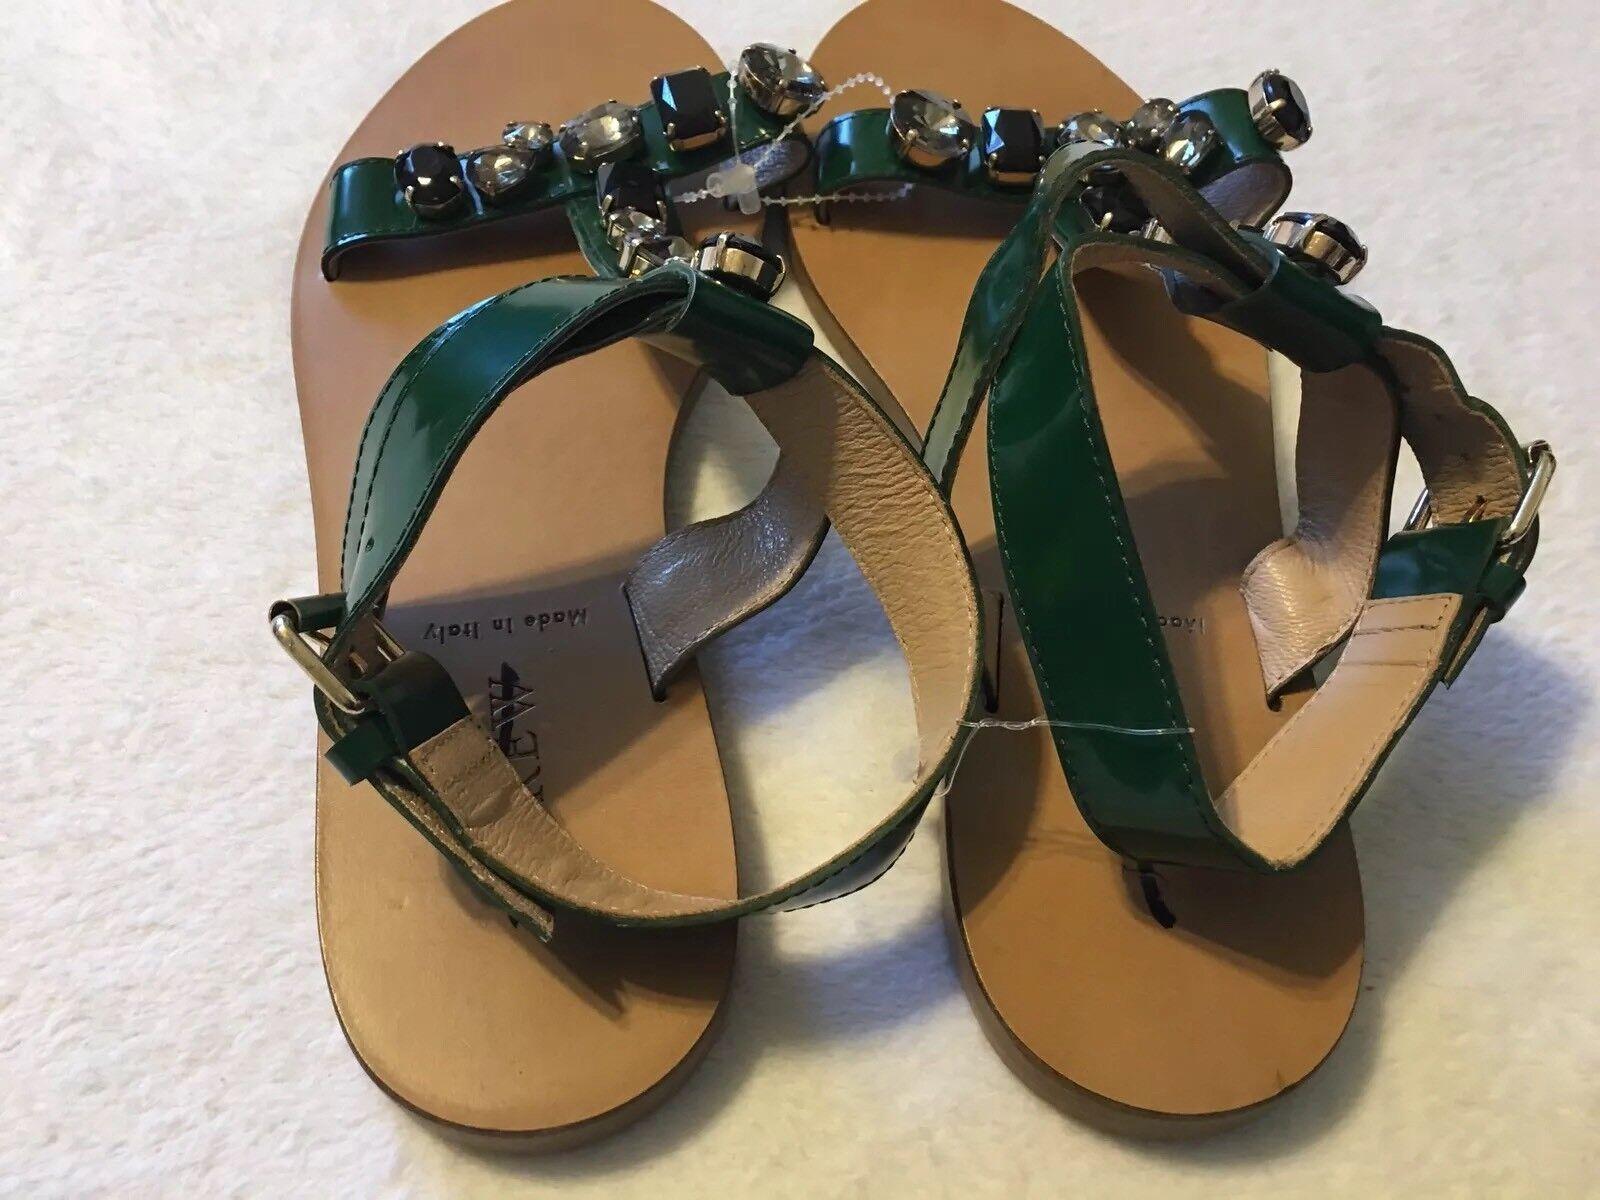 NEU JCREW 178 Tonal Jeweled T-strap Sandales Größe7 In Academic Green C4182